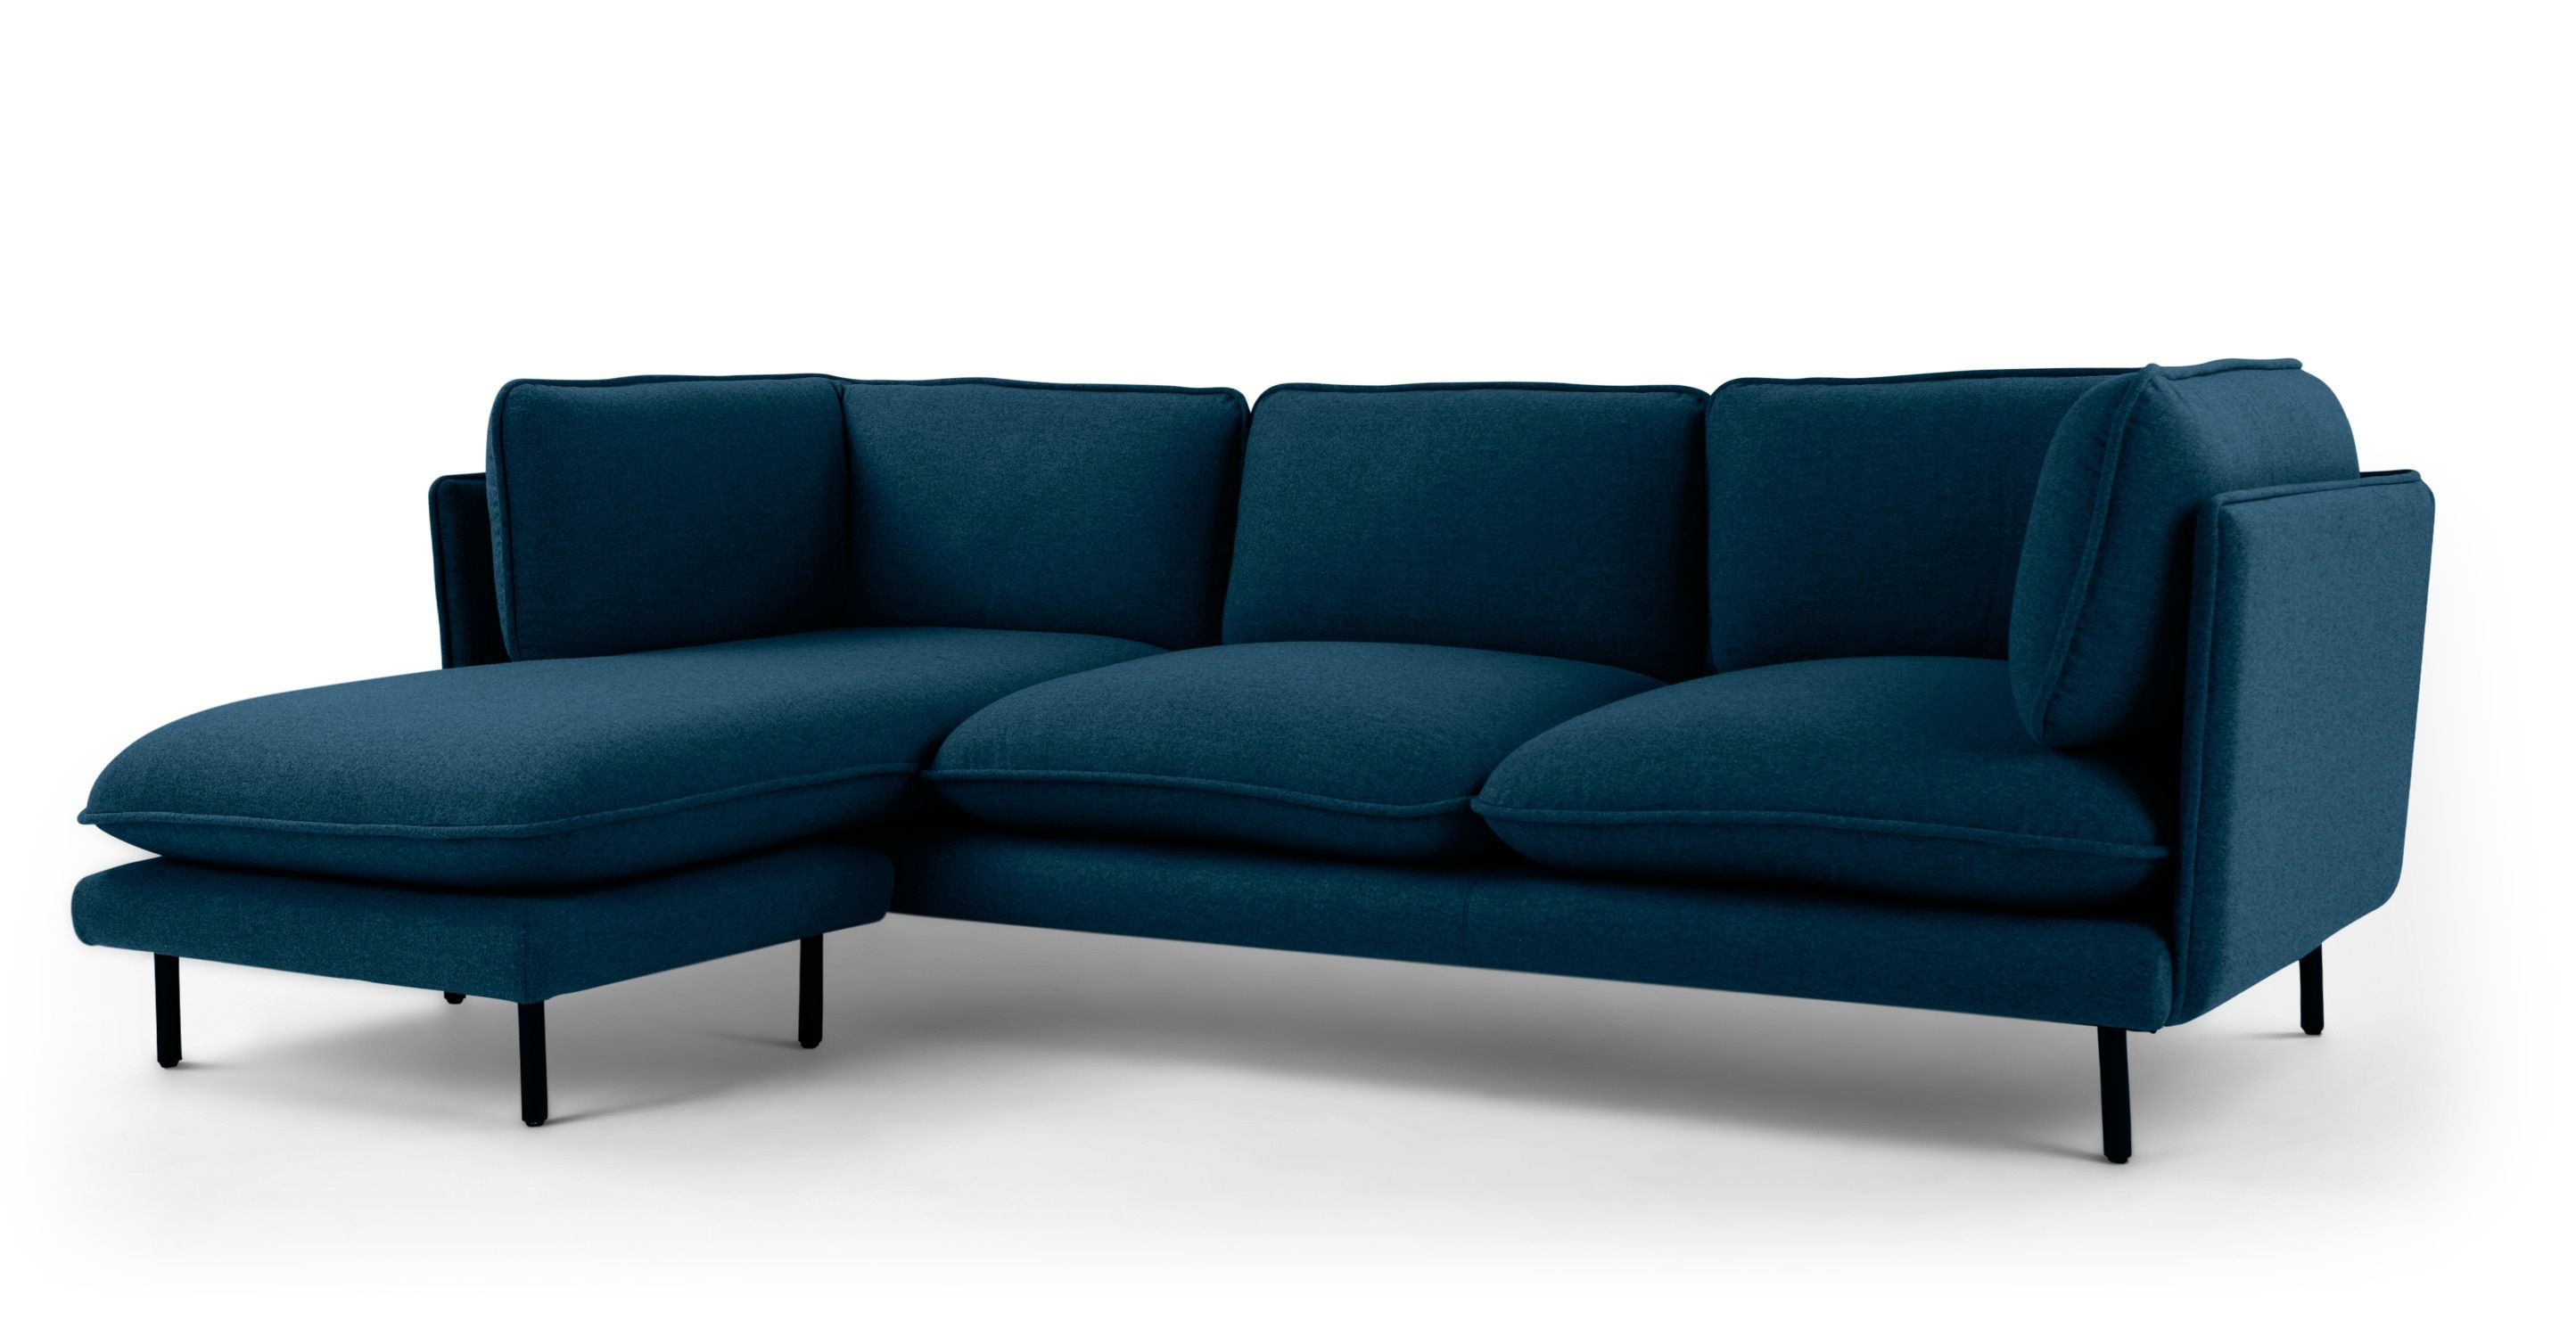 Wes Canap D Angle Bleu P Trole Bleu P Trole Petrole Et Angles # Canape D'Angle Style Scandinave Bleu